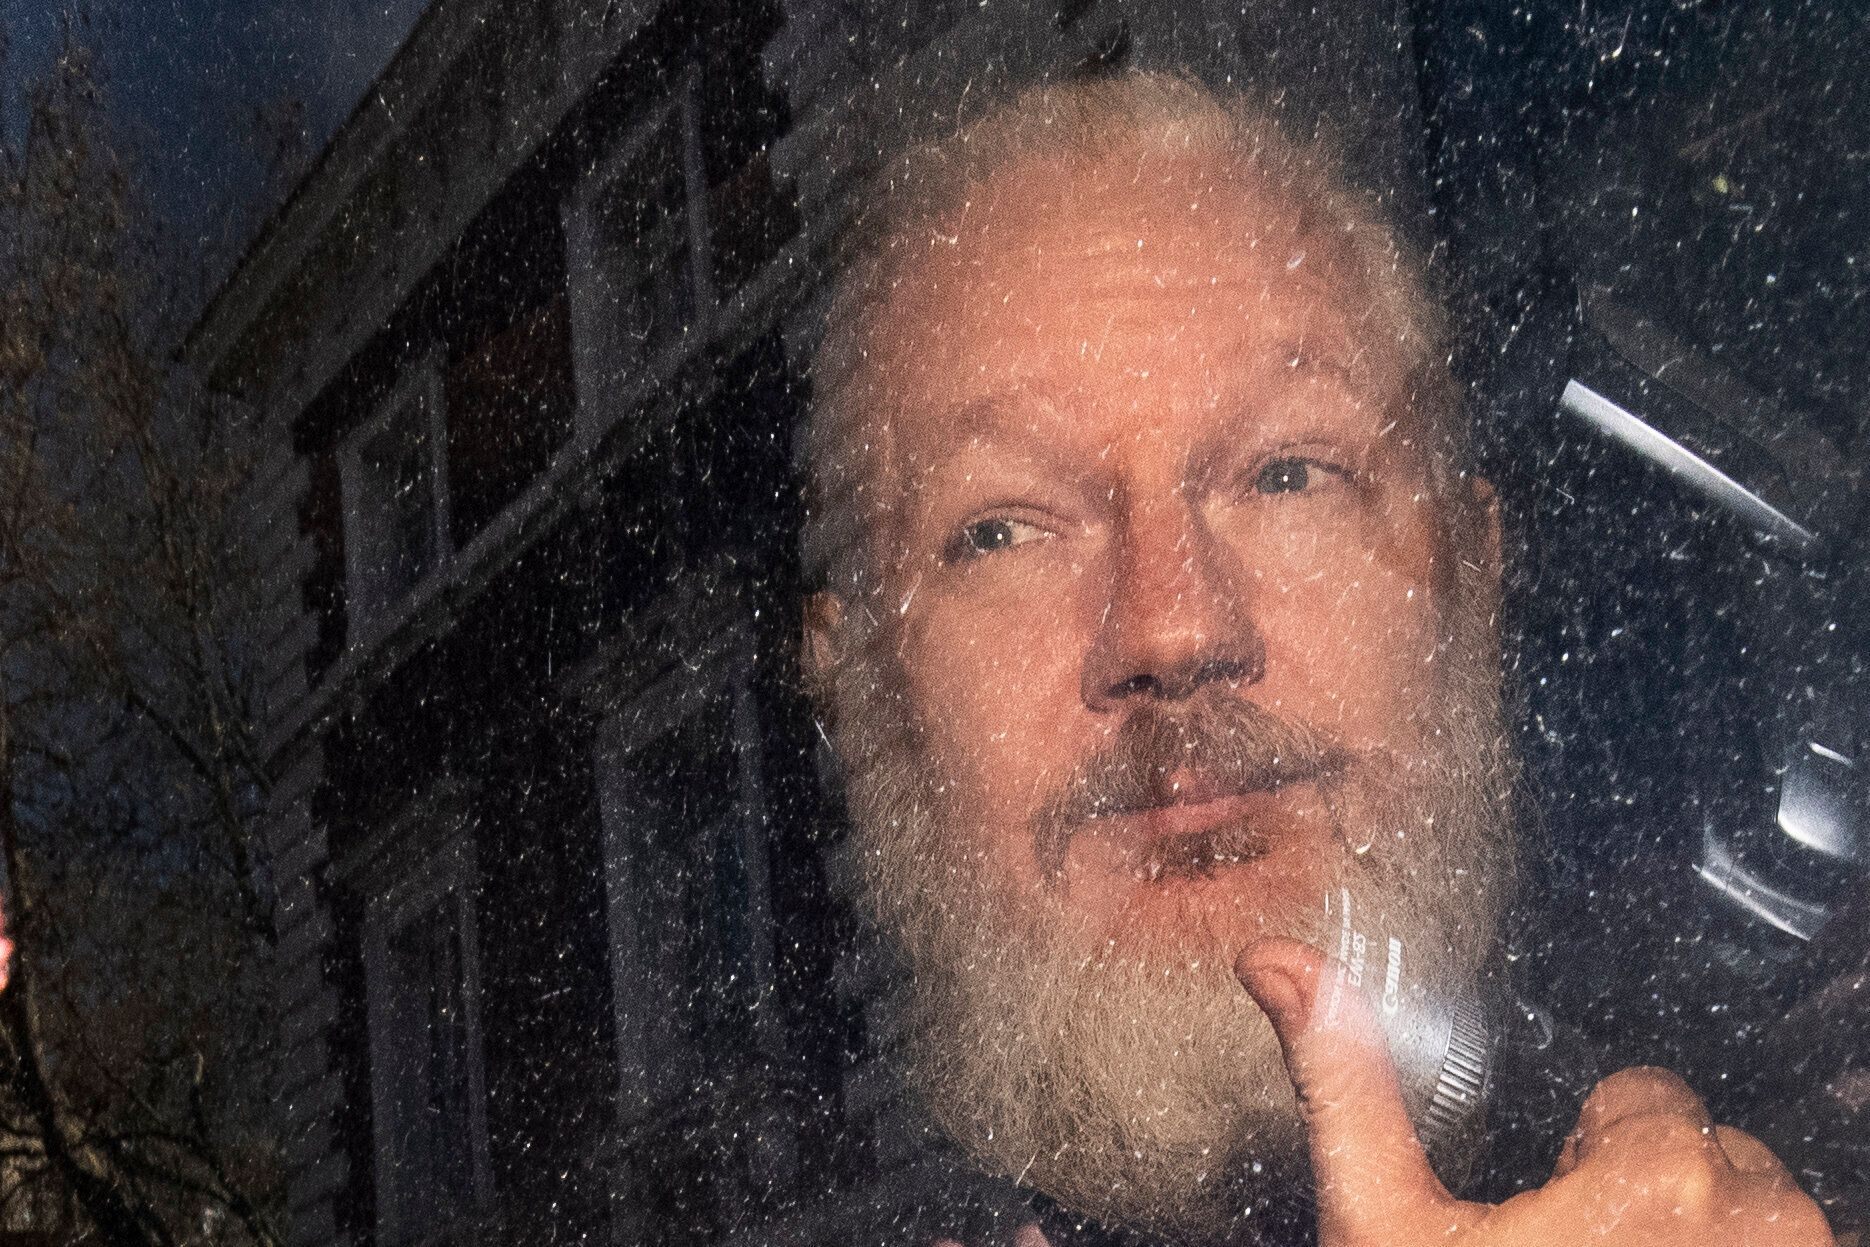 Julian Assange: Swedish Prosecutors Request Arrest Over Rape Allegation